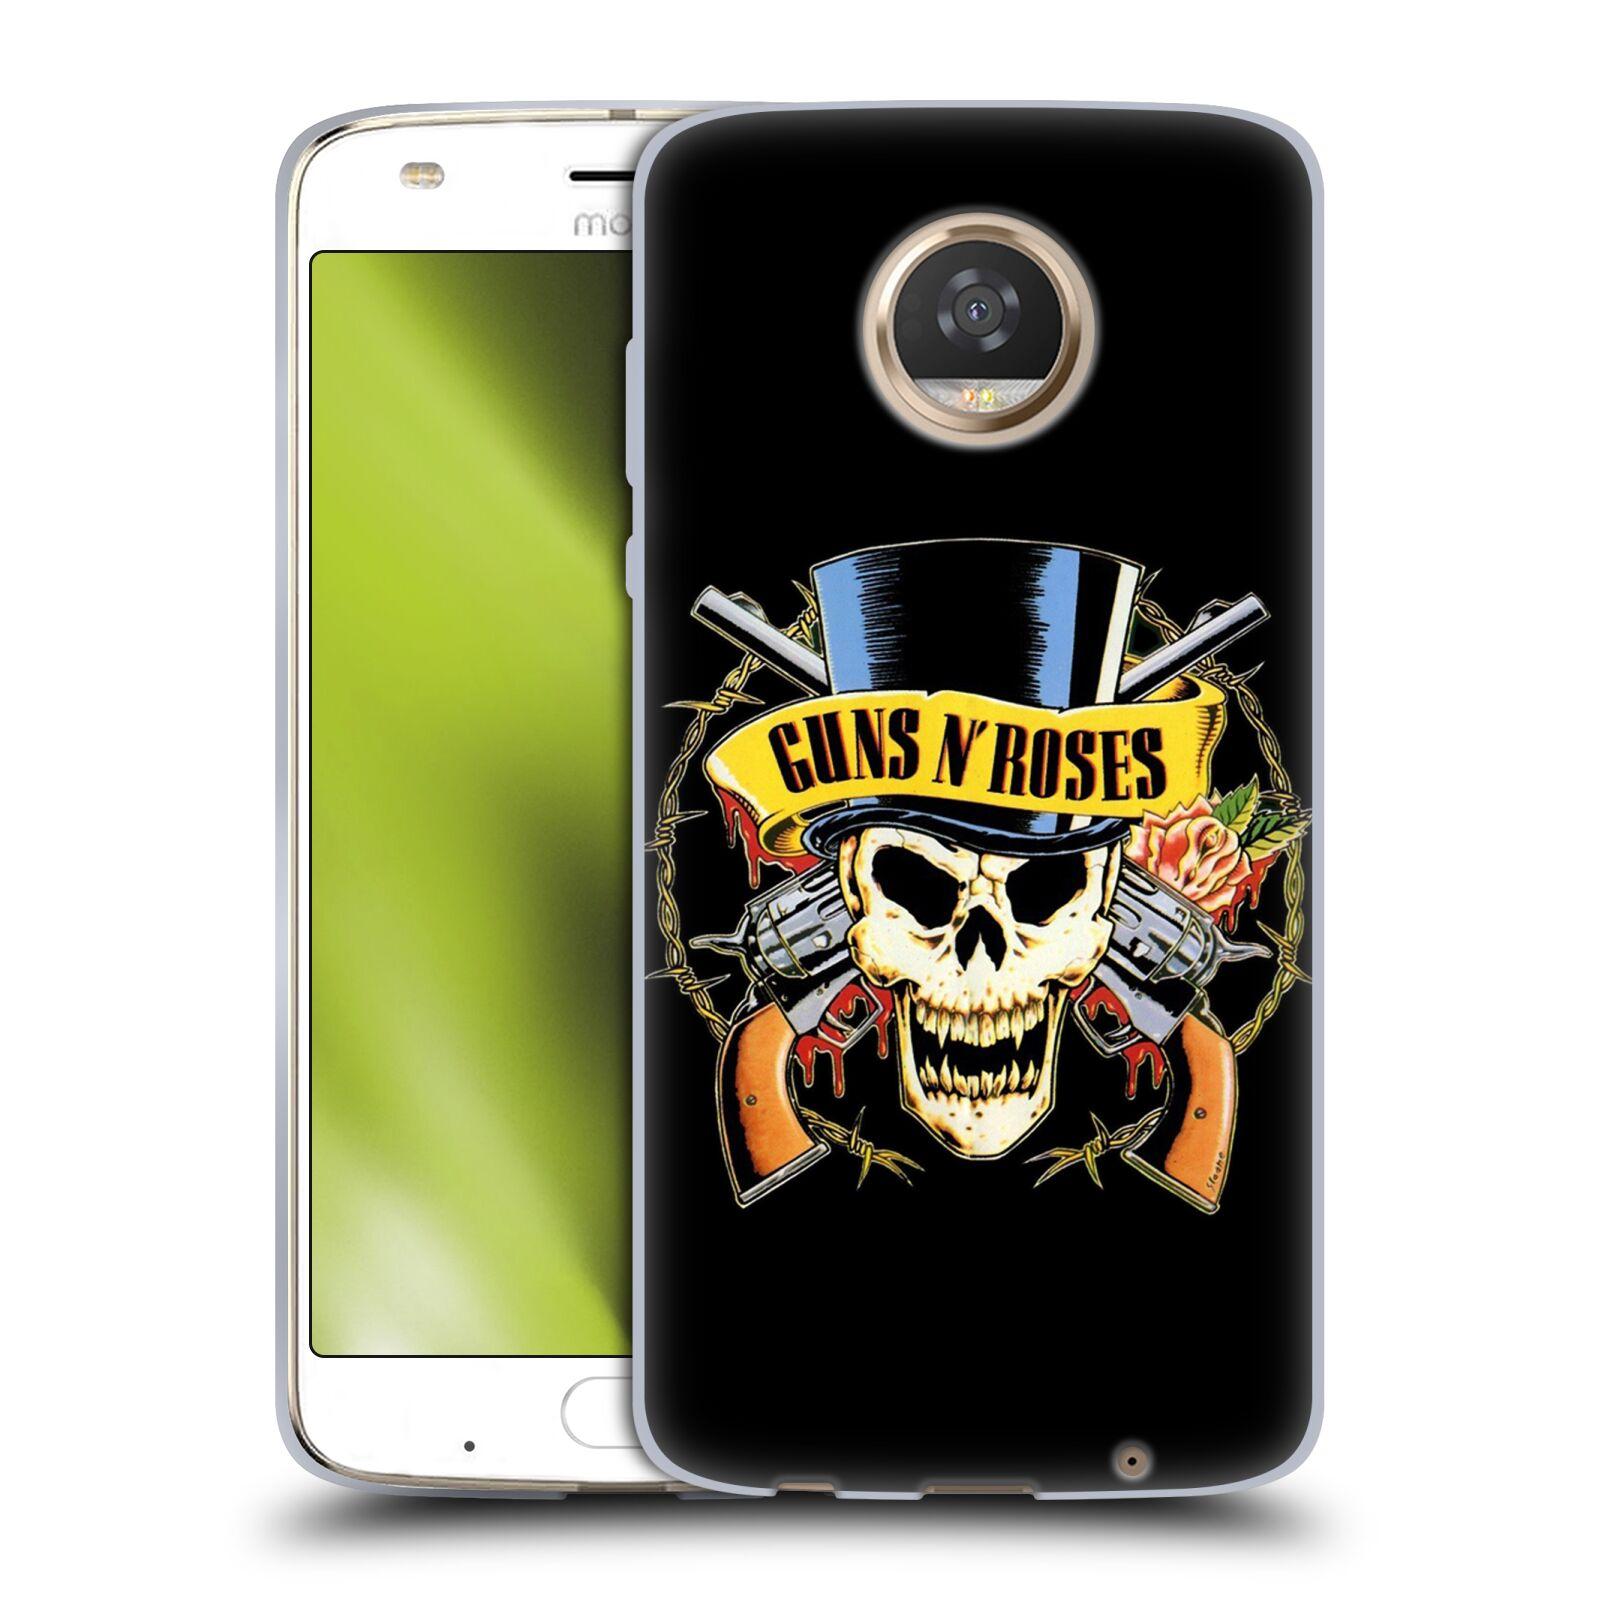 Silikonové pouzdro na mobil Lenovo Moto Z2 Play - Head Case - Guns N' Roses - Lebka